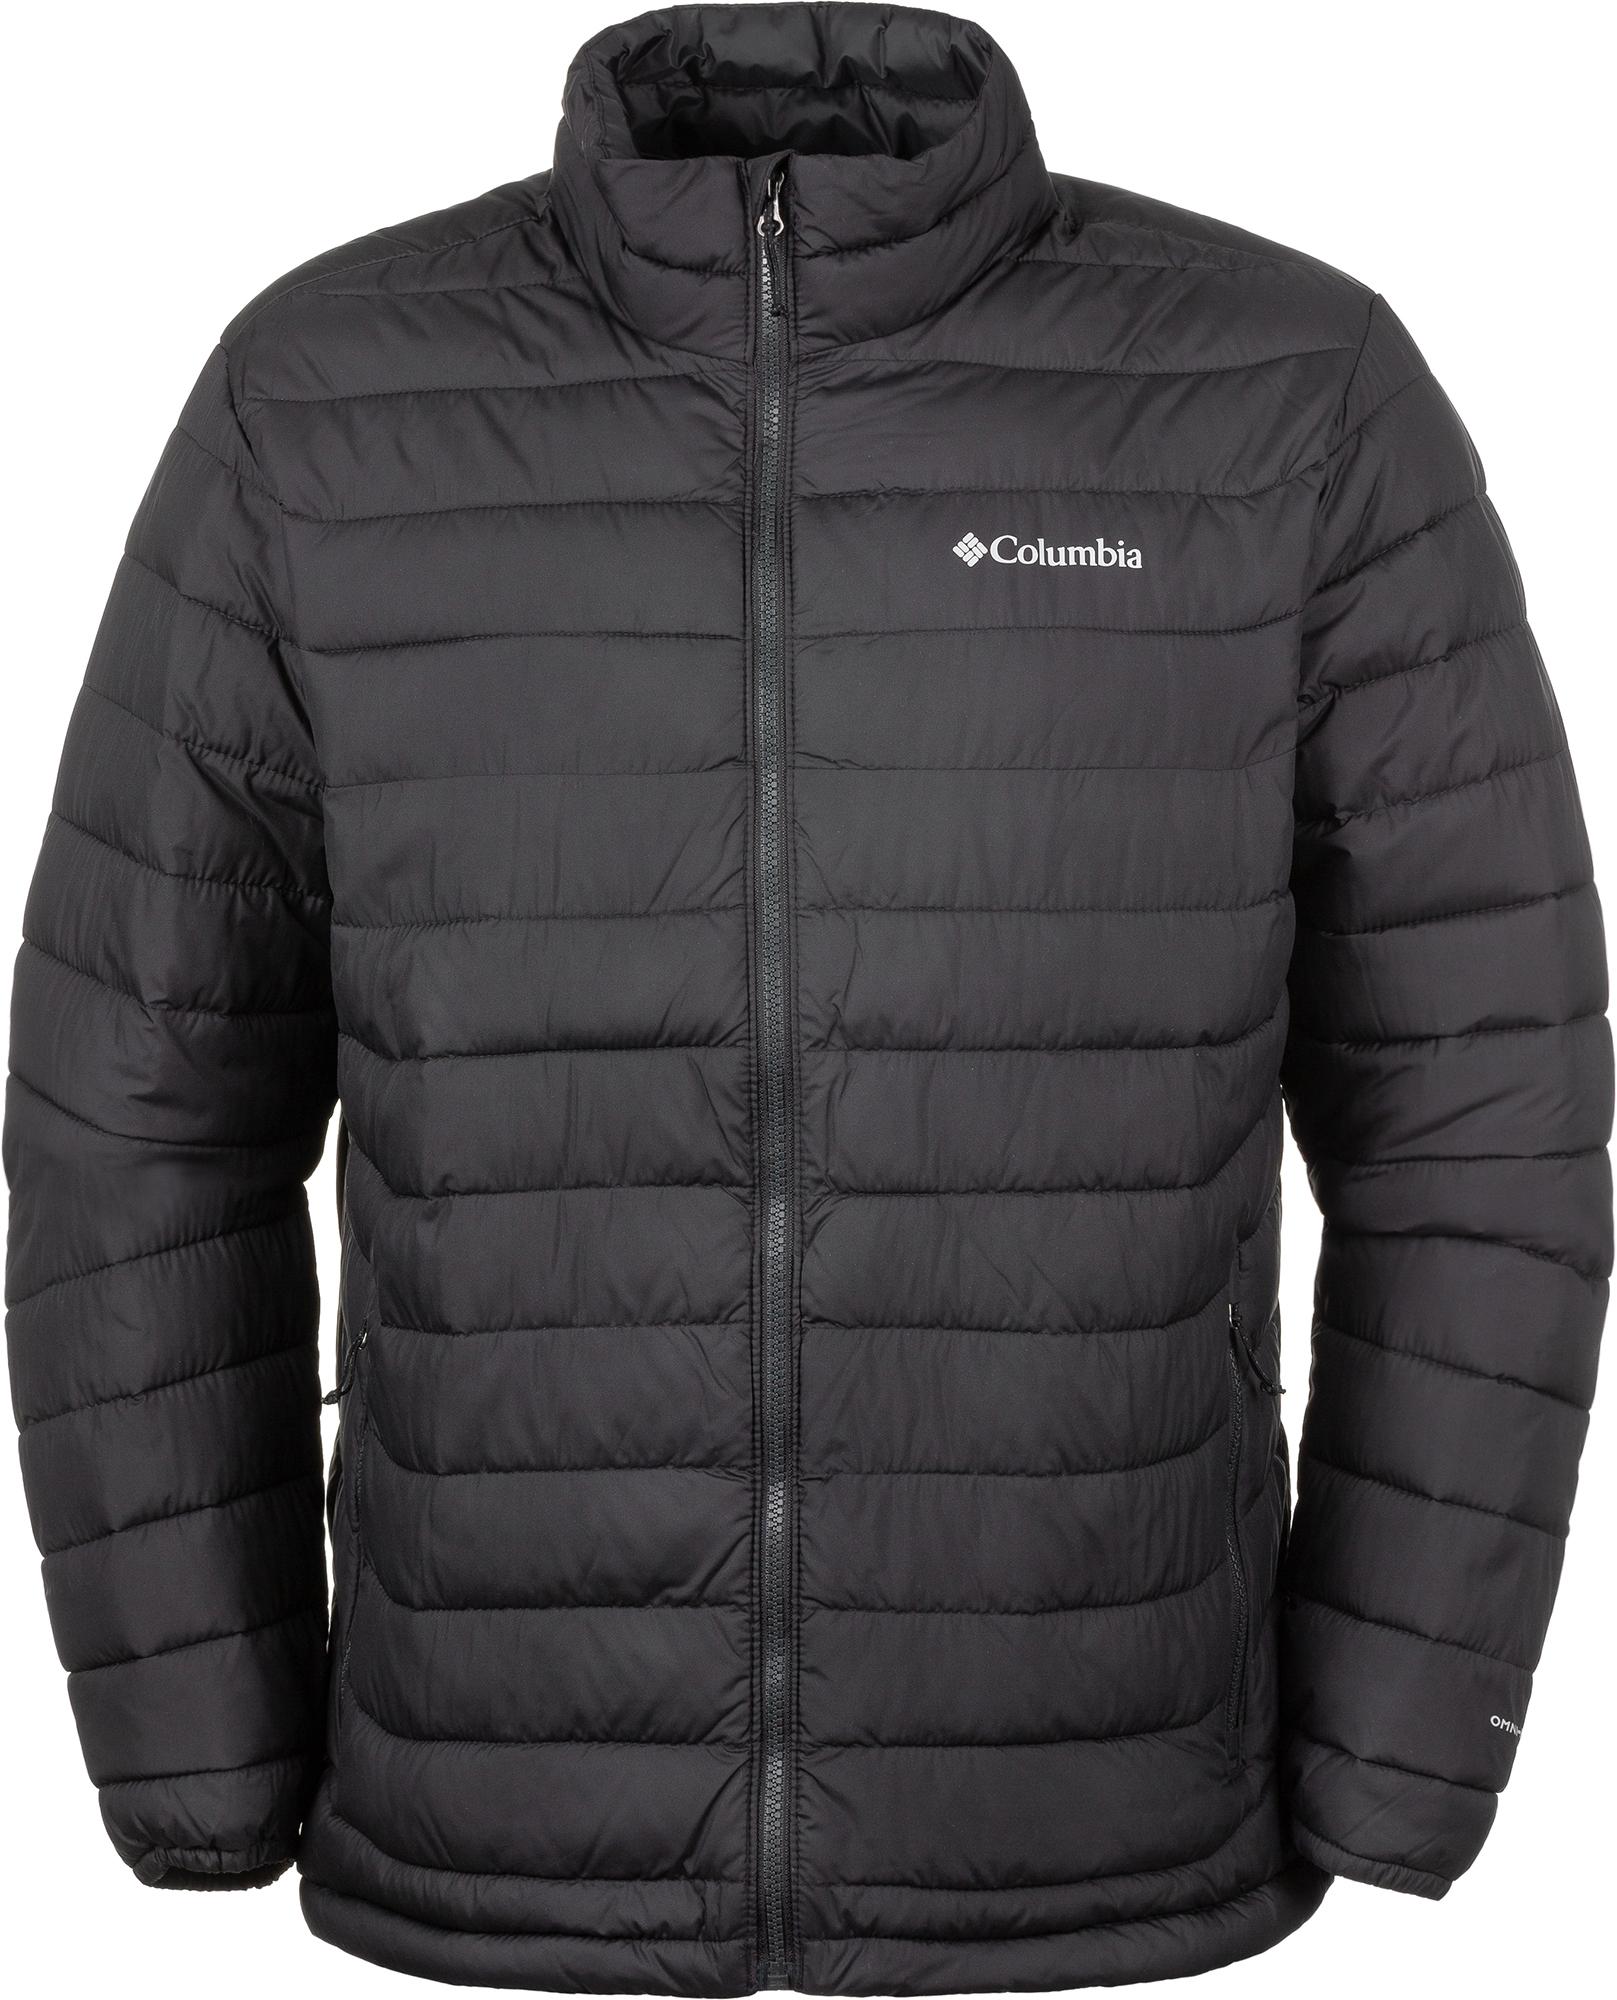 Columbia Куртка утепленная мужская Columbia Powder Lite™, размер 54 куртка утепленная conso wear conso wear mp002xw0tupn